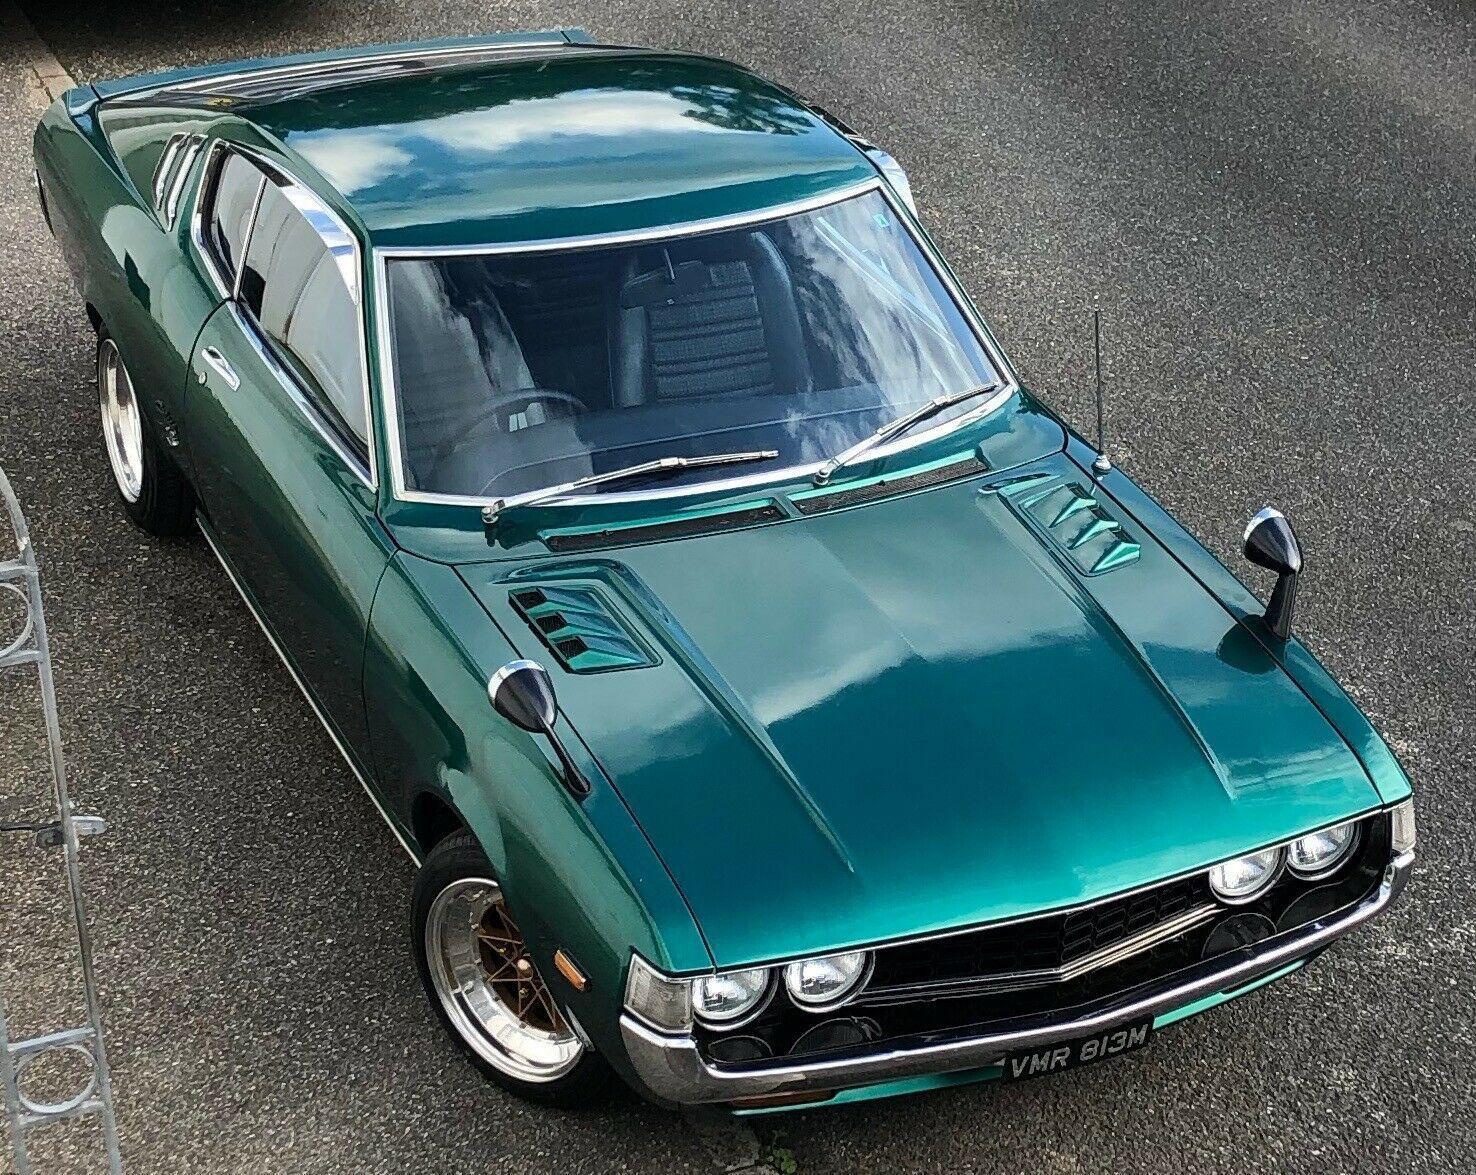 Toyota Celica Liftback 2tg Ta27 Jdm 1974 For Sale Rare Classic Car Toyota Celica Liftback 2tg Ta27 Jdm 1974 For Sale In 2020 Japanische Autos Autos Japan